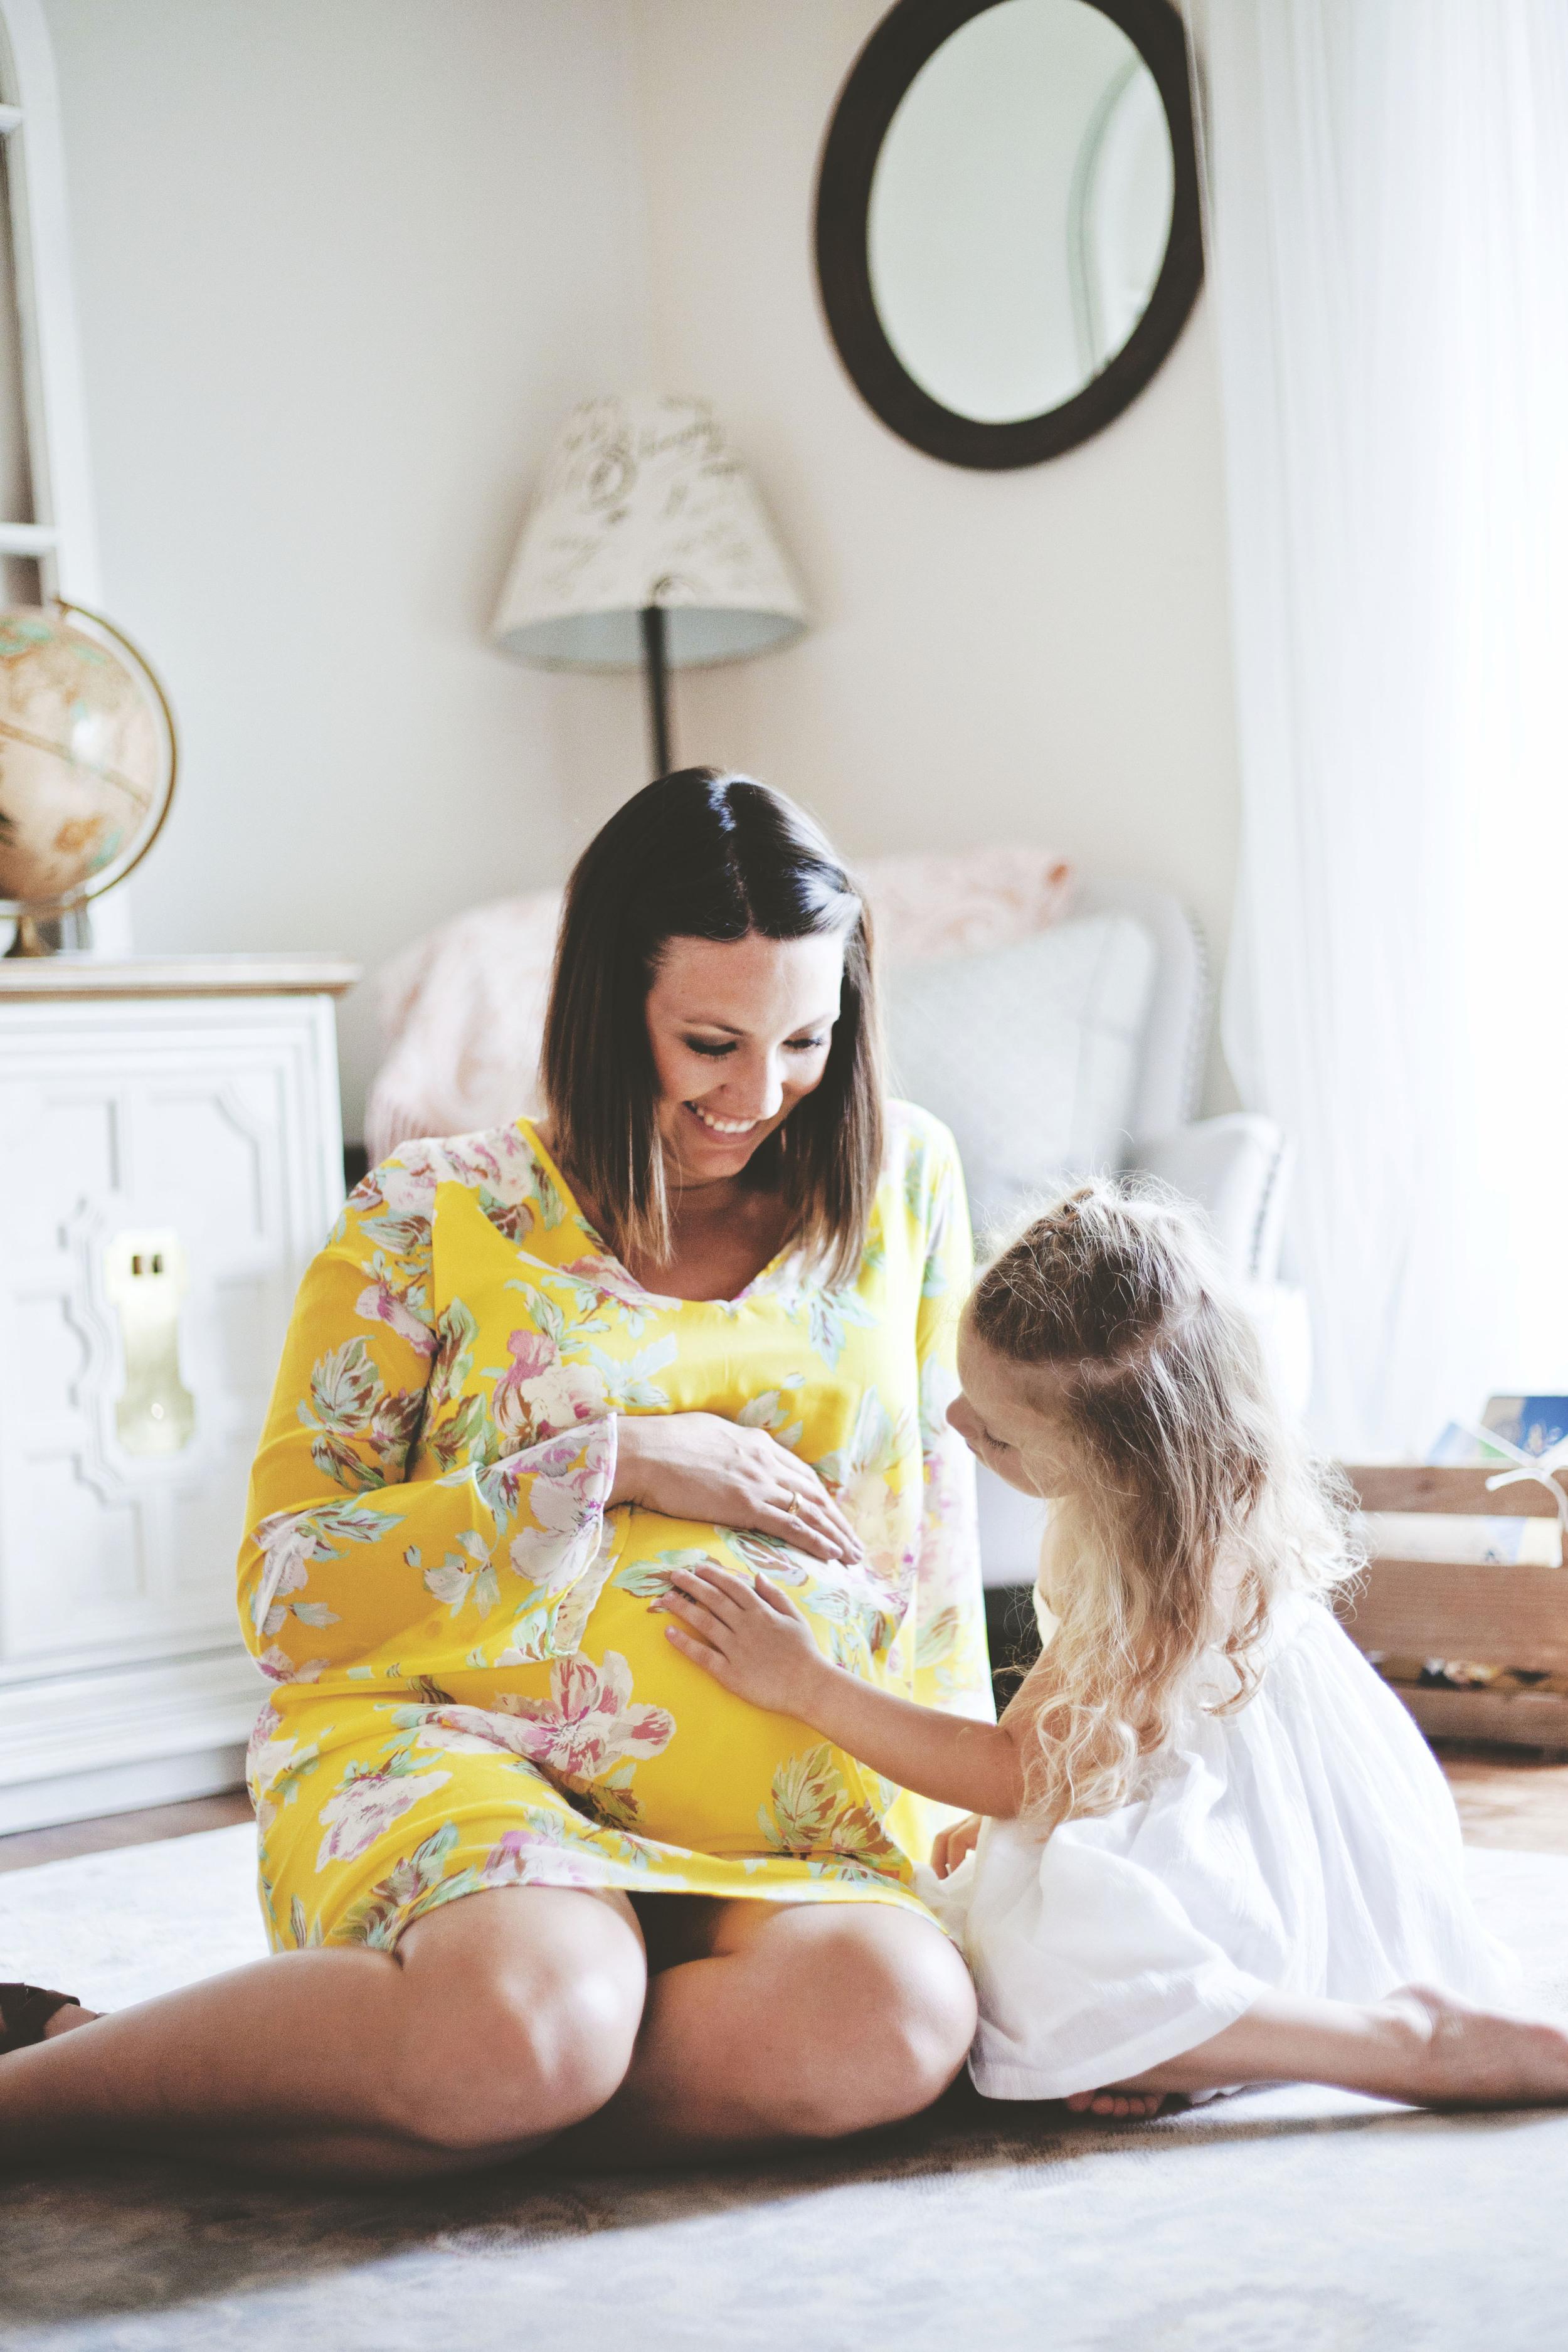 Maternity Photoshoot With Pinkblush